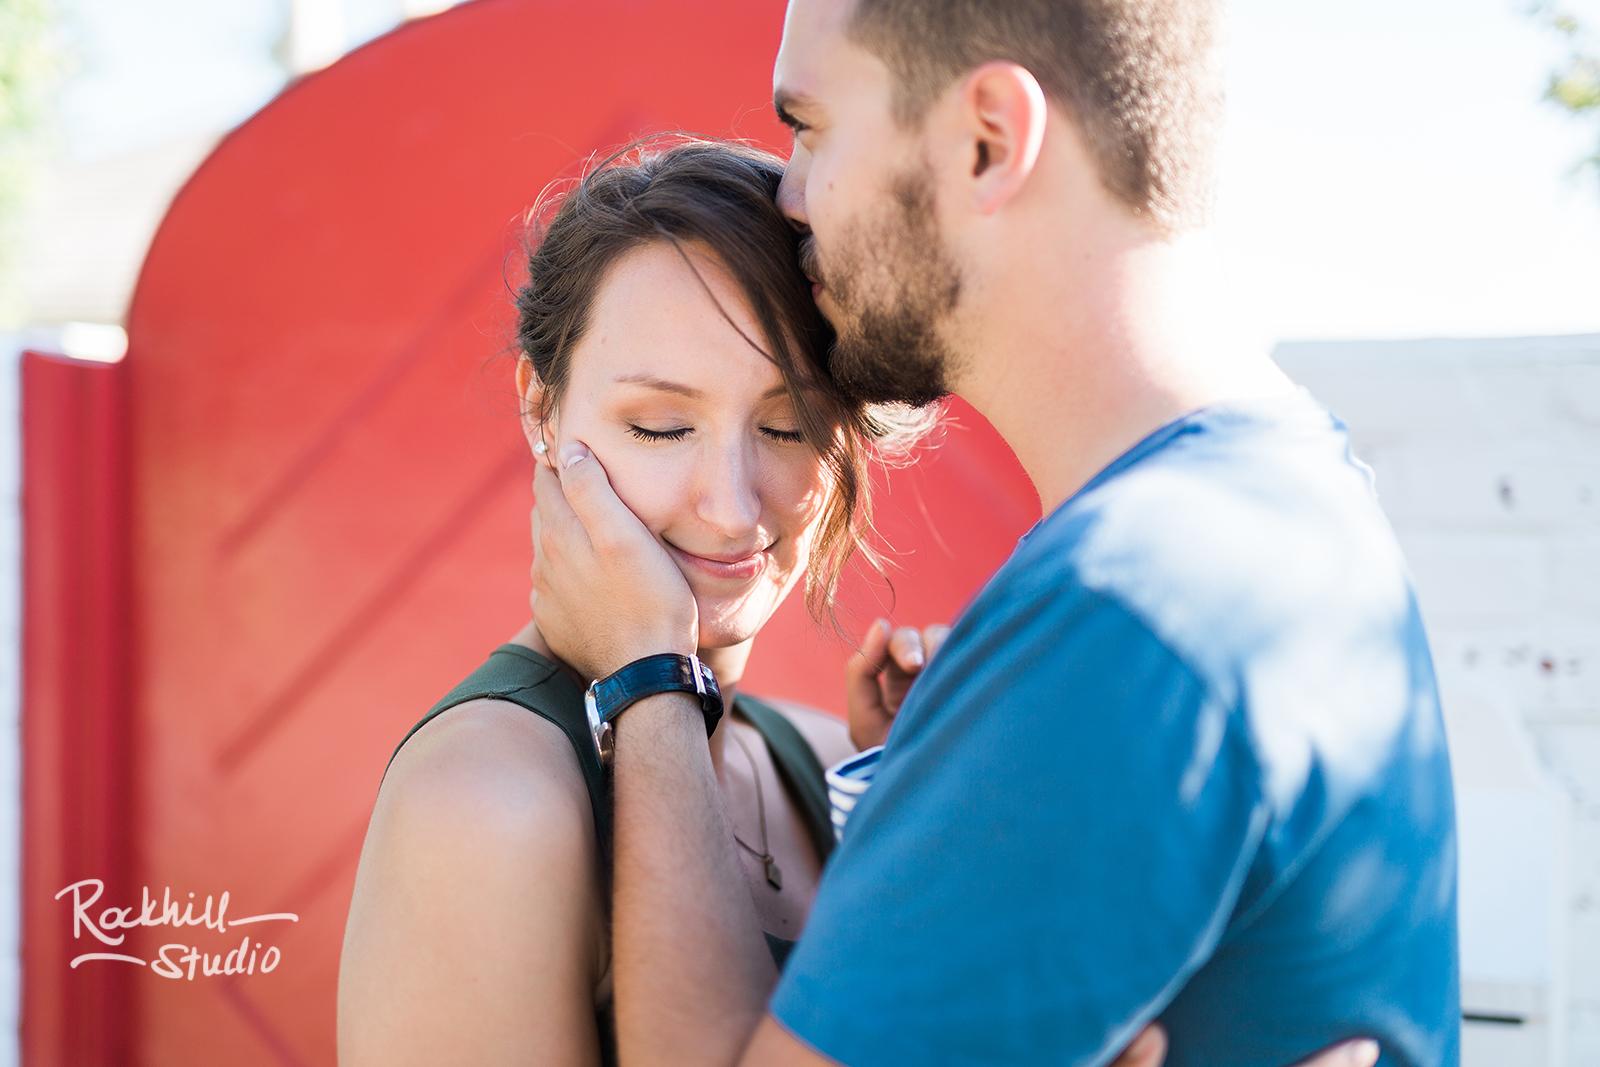 mackinac-island-wedding-engagement-northern-michigan-rockhill-studio-jt-13.jpg